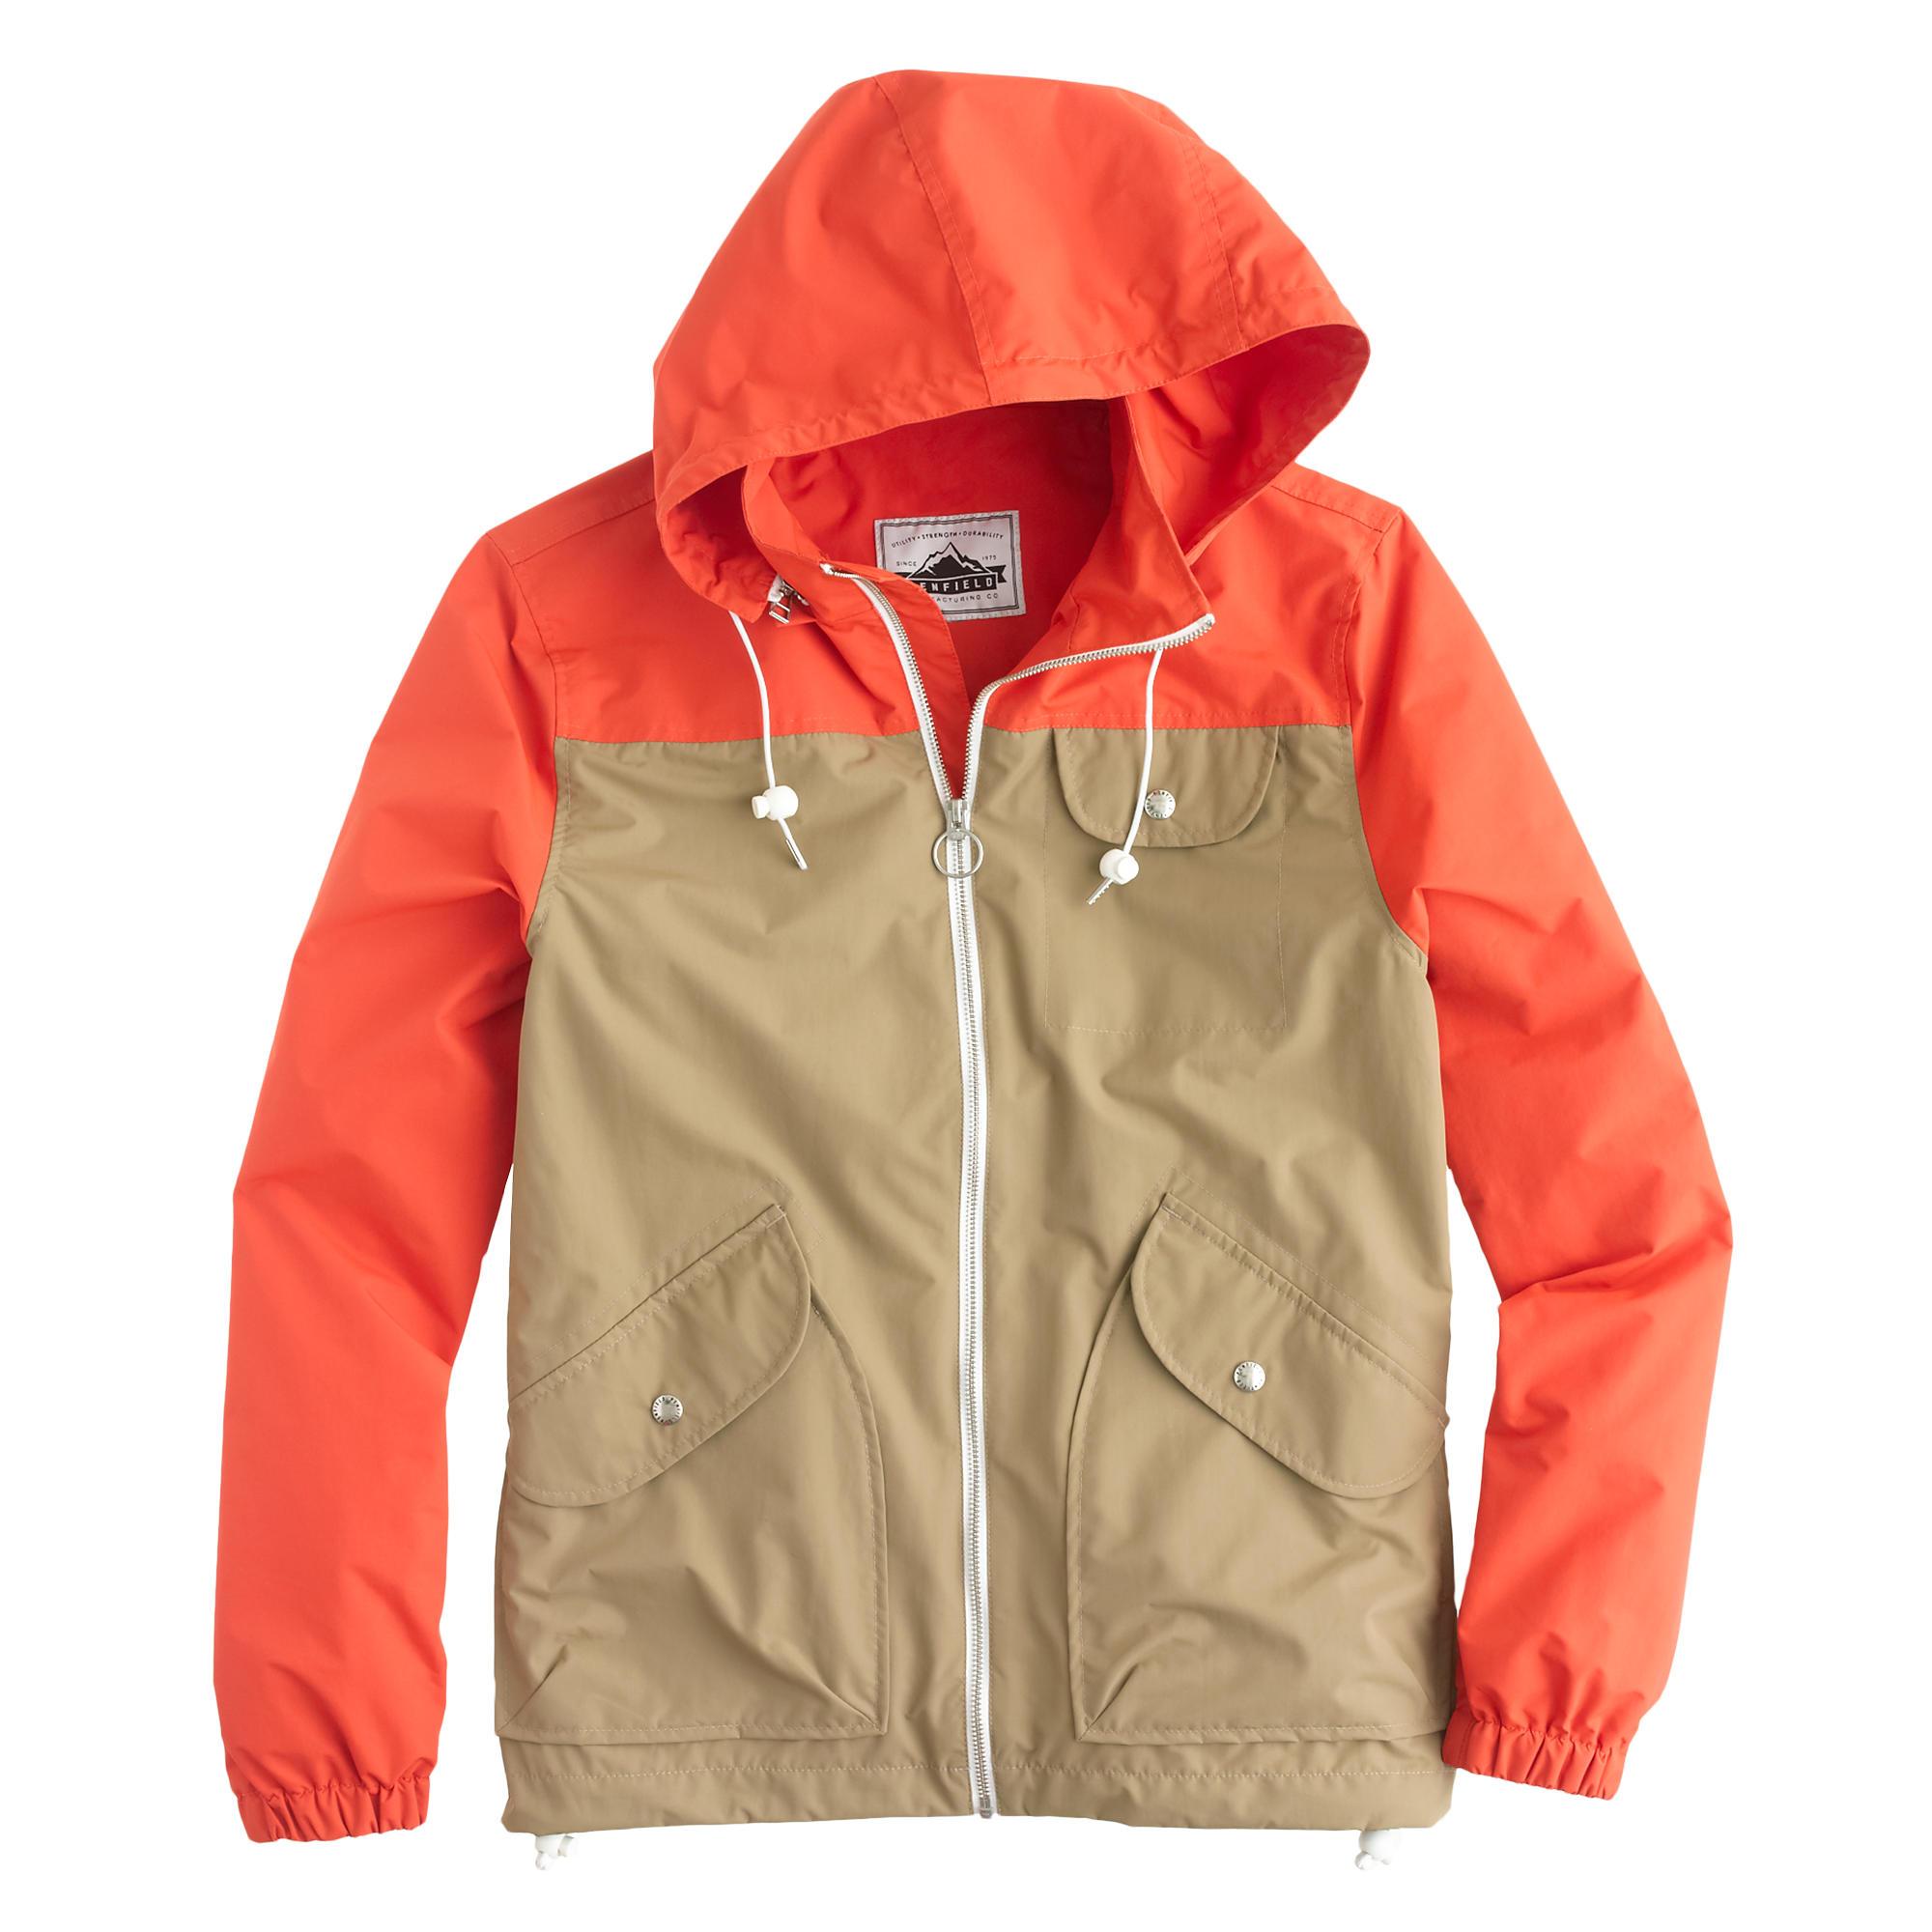 Penfield Rain Jacket